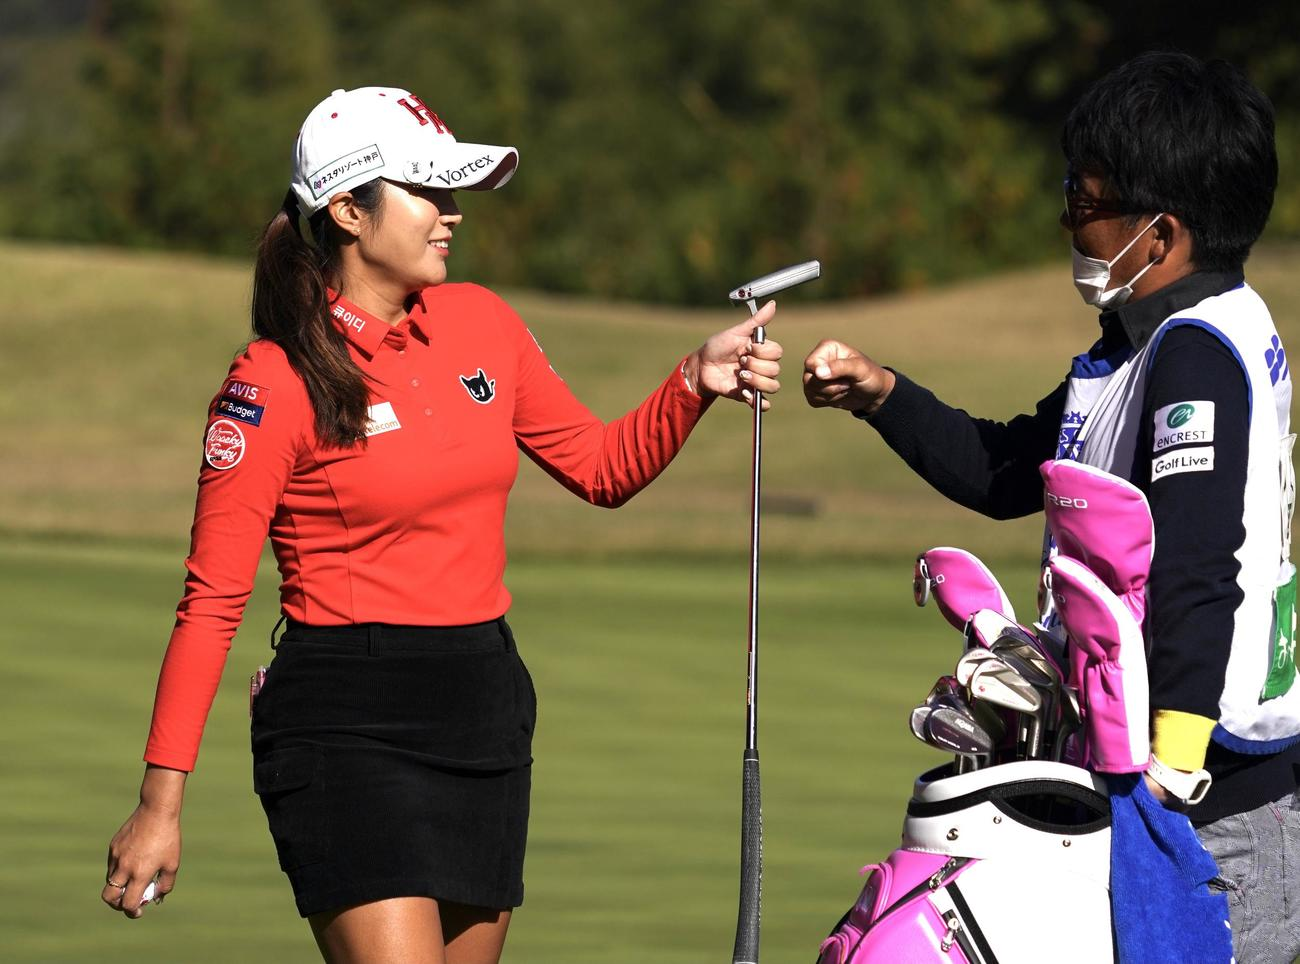 https://www.nikkansports.com/sports/golf/news/img/202011150000294-w1300_0.jpg